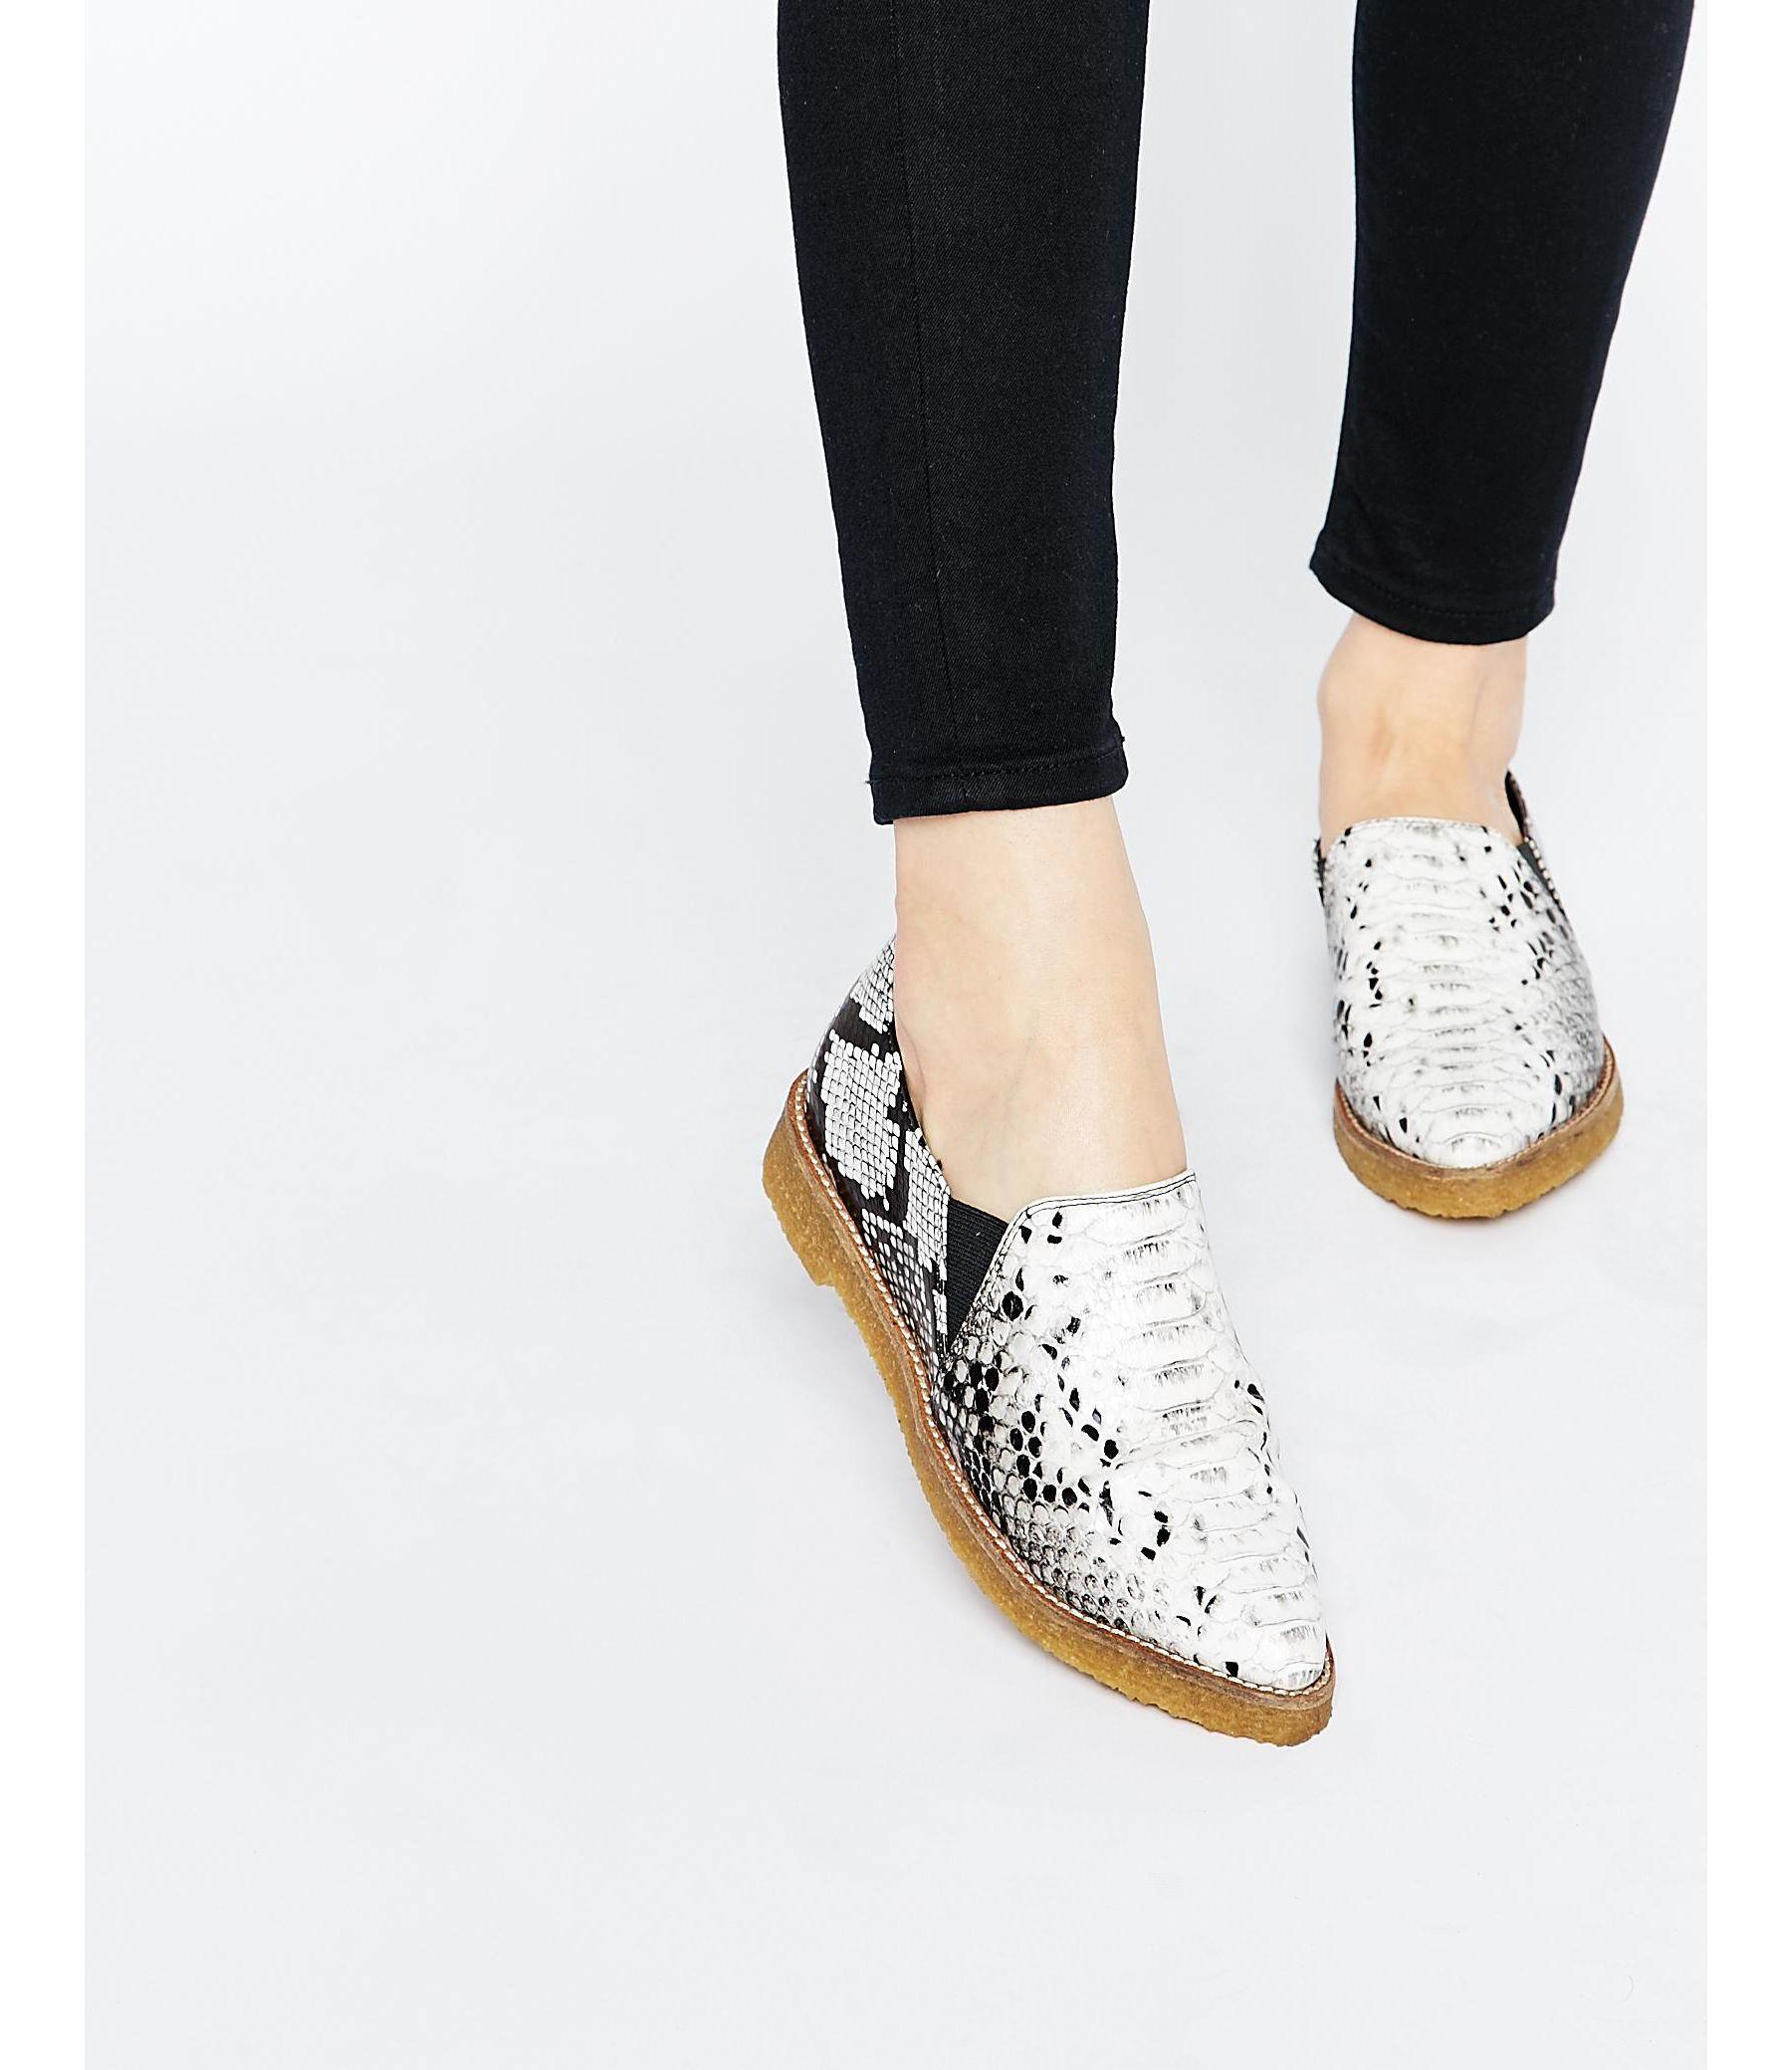 Aetrex Flat Shoes Canada